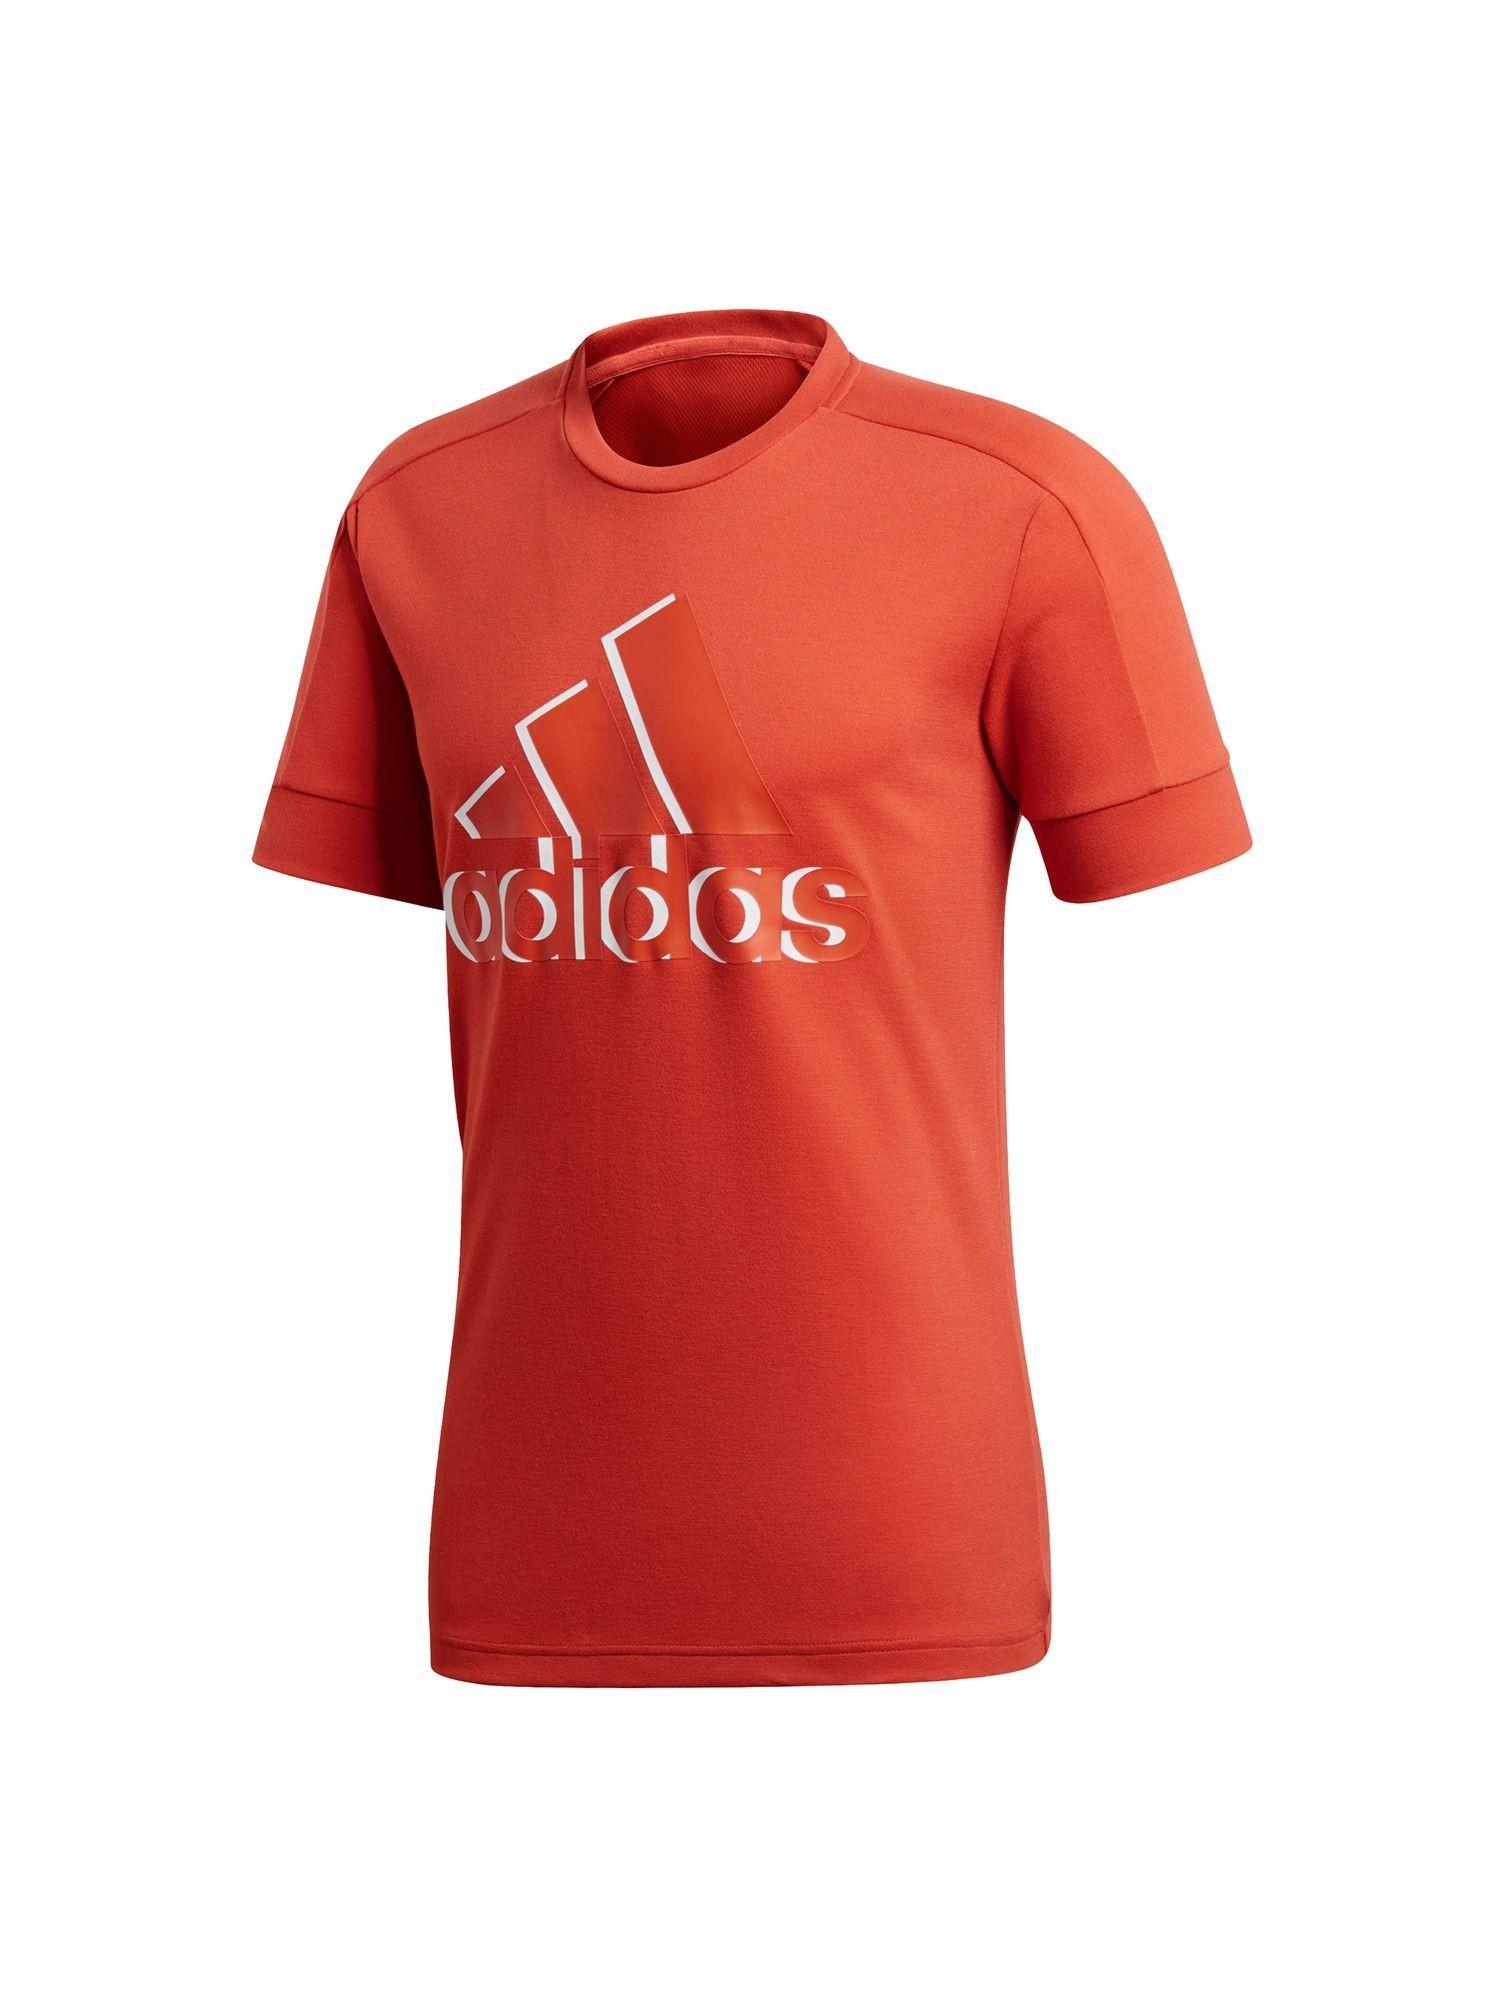 Adidas ID Stadium Badge of Sport T-Shirt